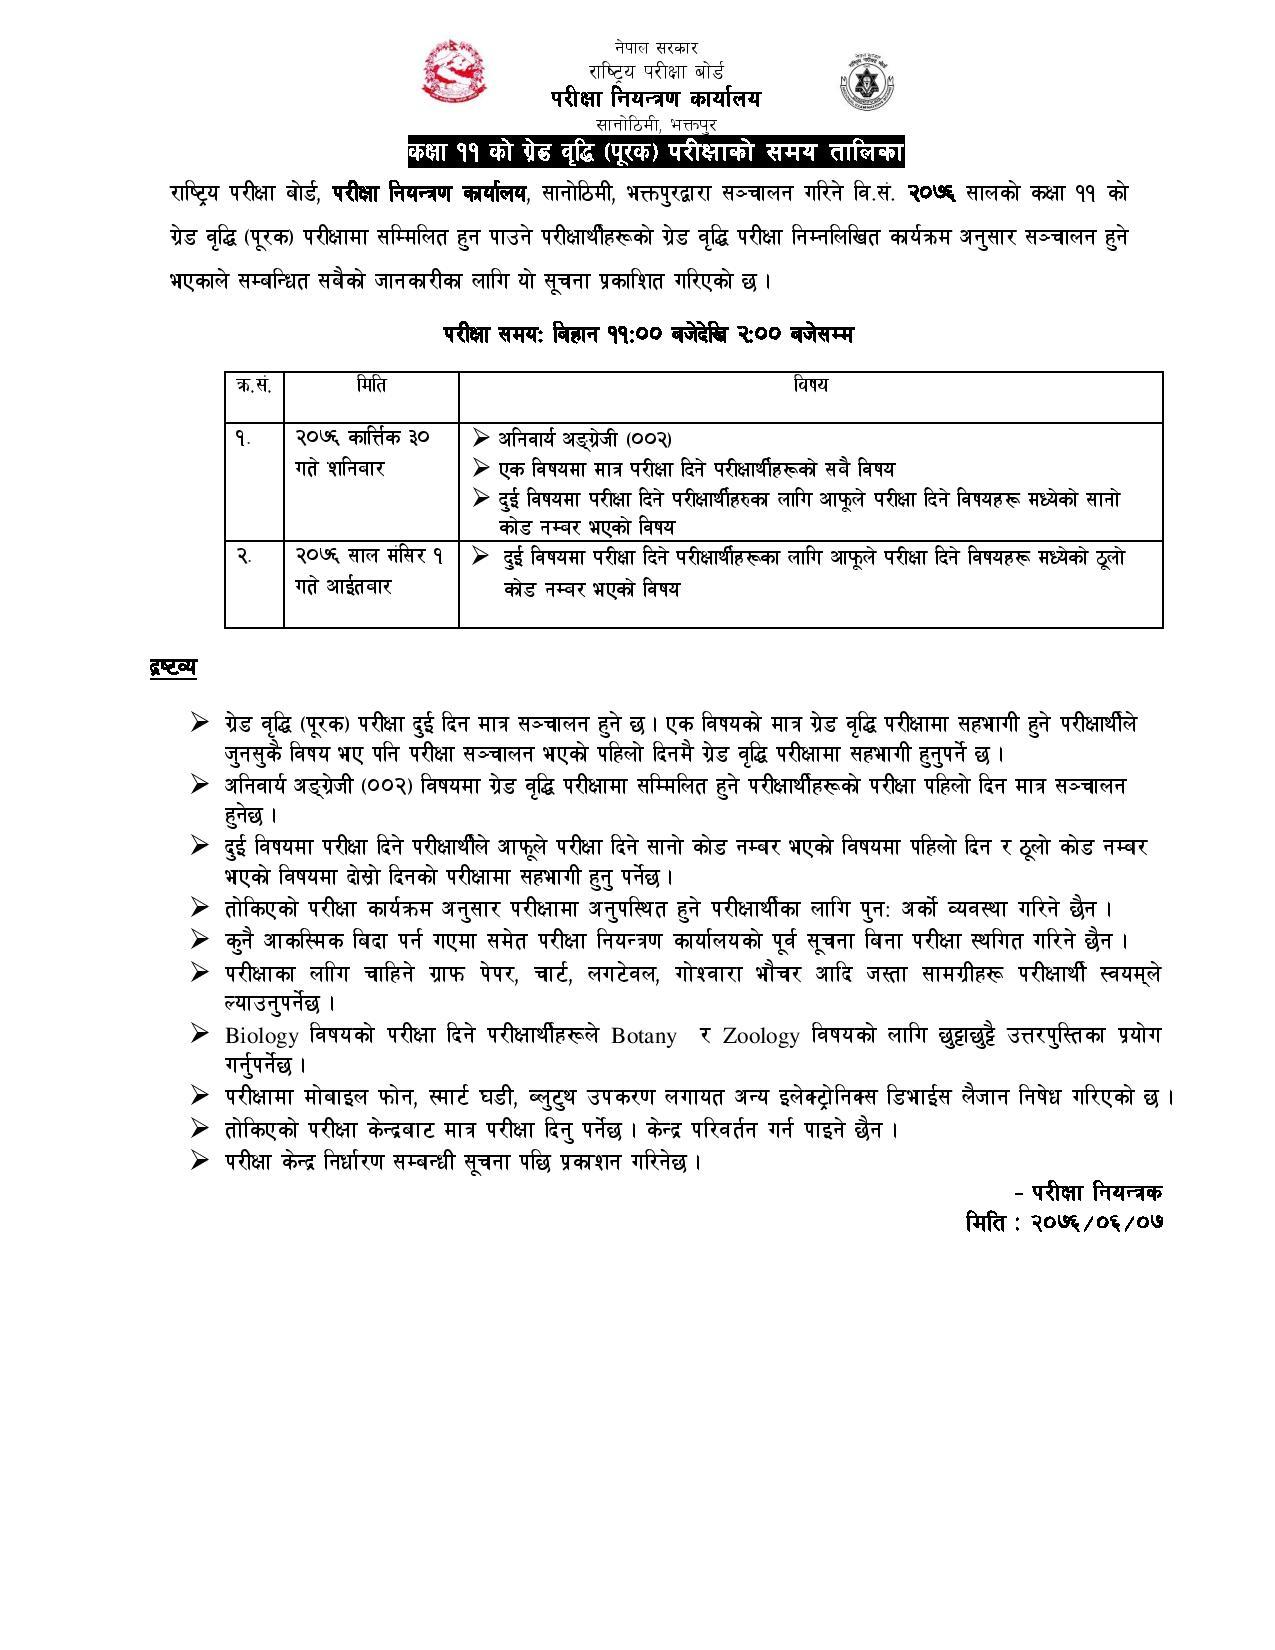 Grade improvement notice and examination schedule of Class 11